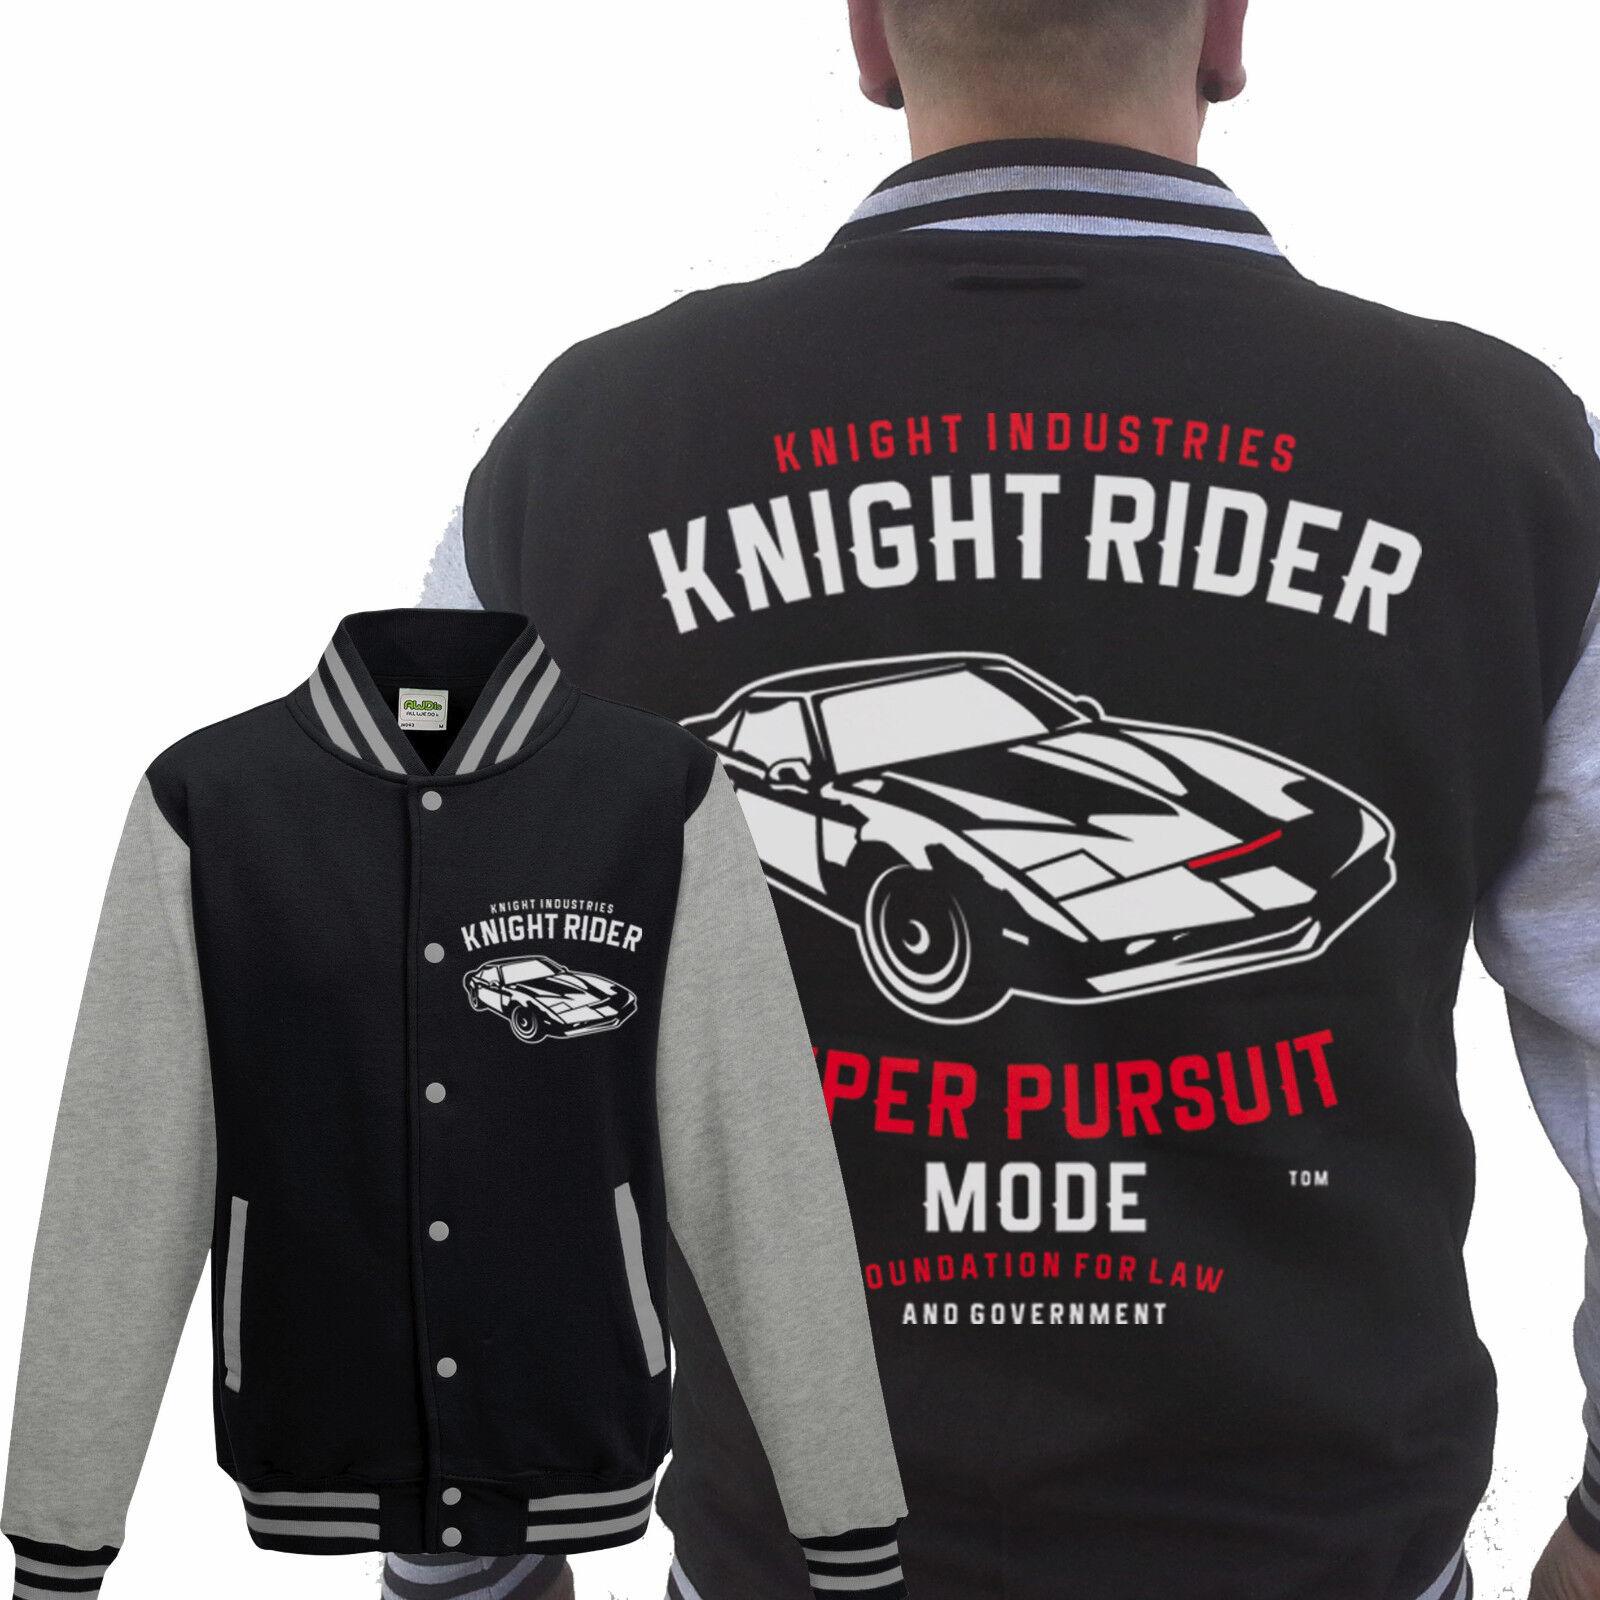 Knight Rider COLLEGE Giacca Grigio, Hasselhoff, Baywatch, 80er nuovo culto serigrafia Kitt